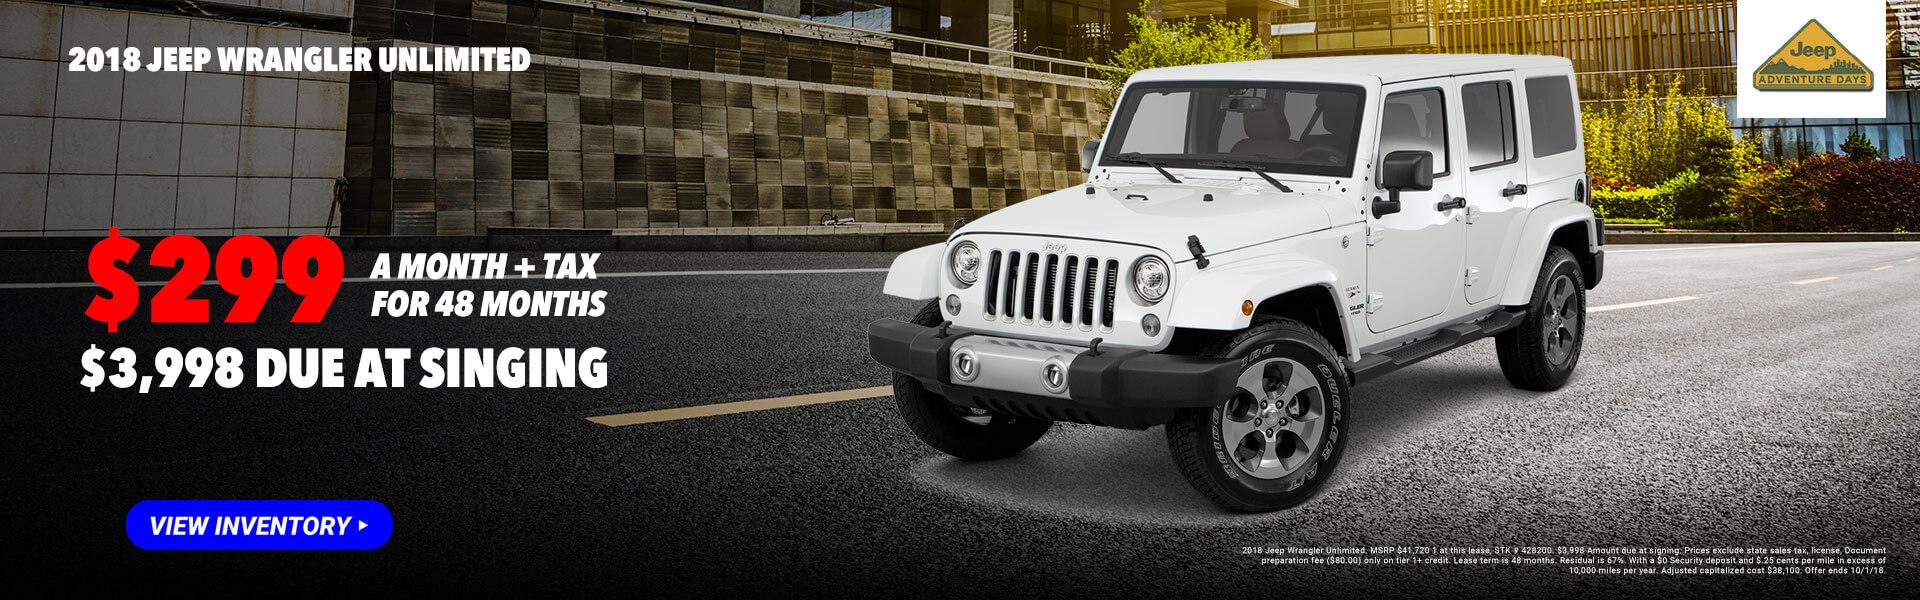 2018 Jeep Wrangler Unl